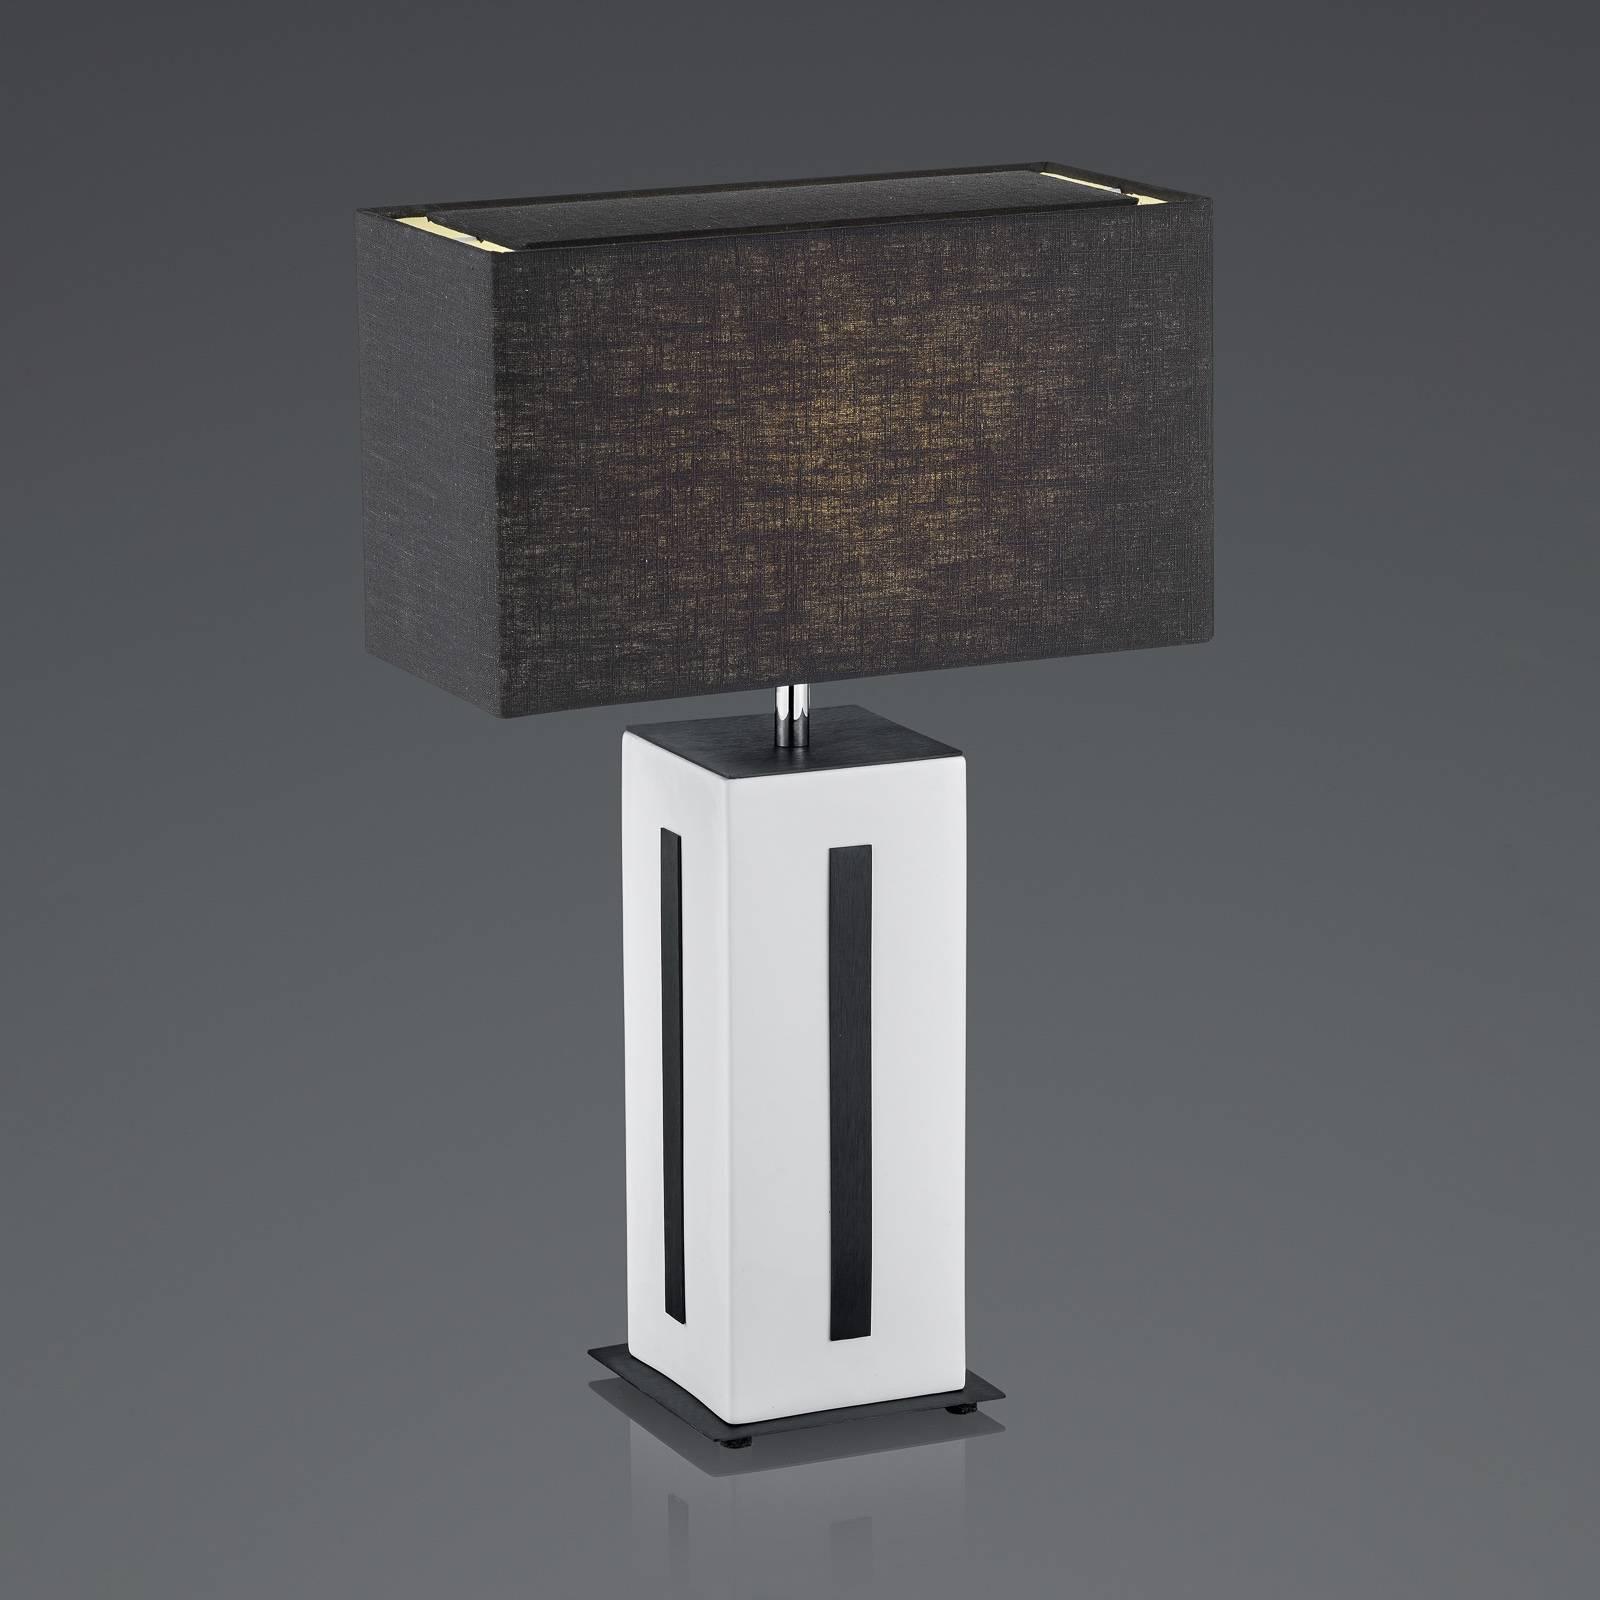 BANKAMP Karlo lampe à poser blanche/noire, H56cm